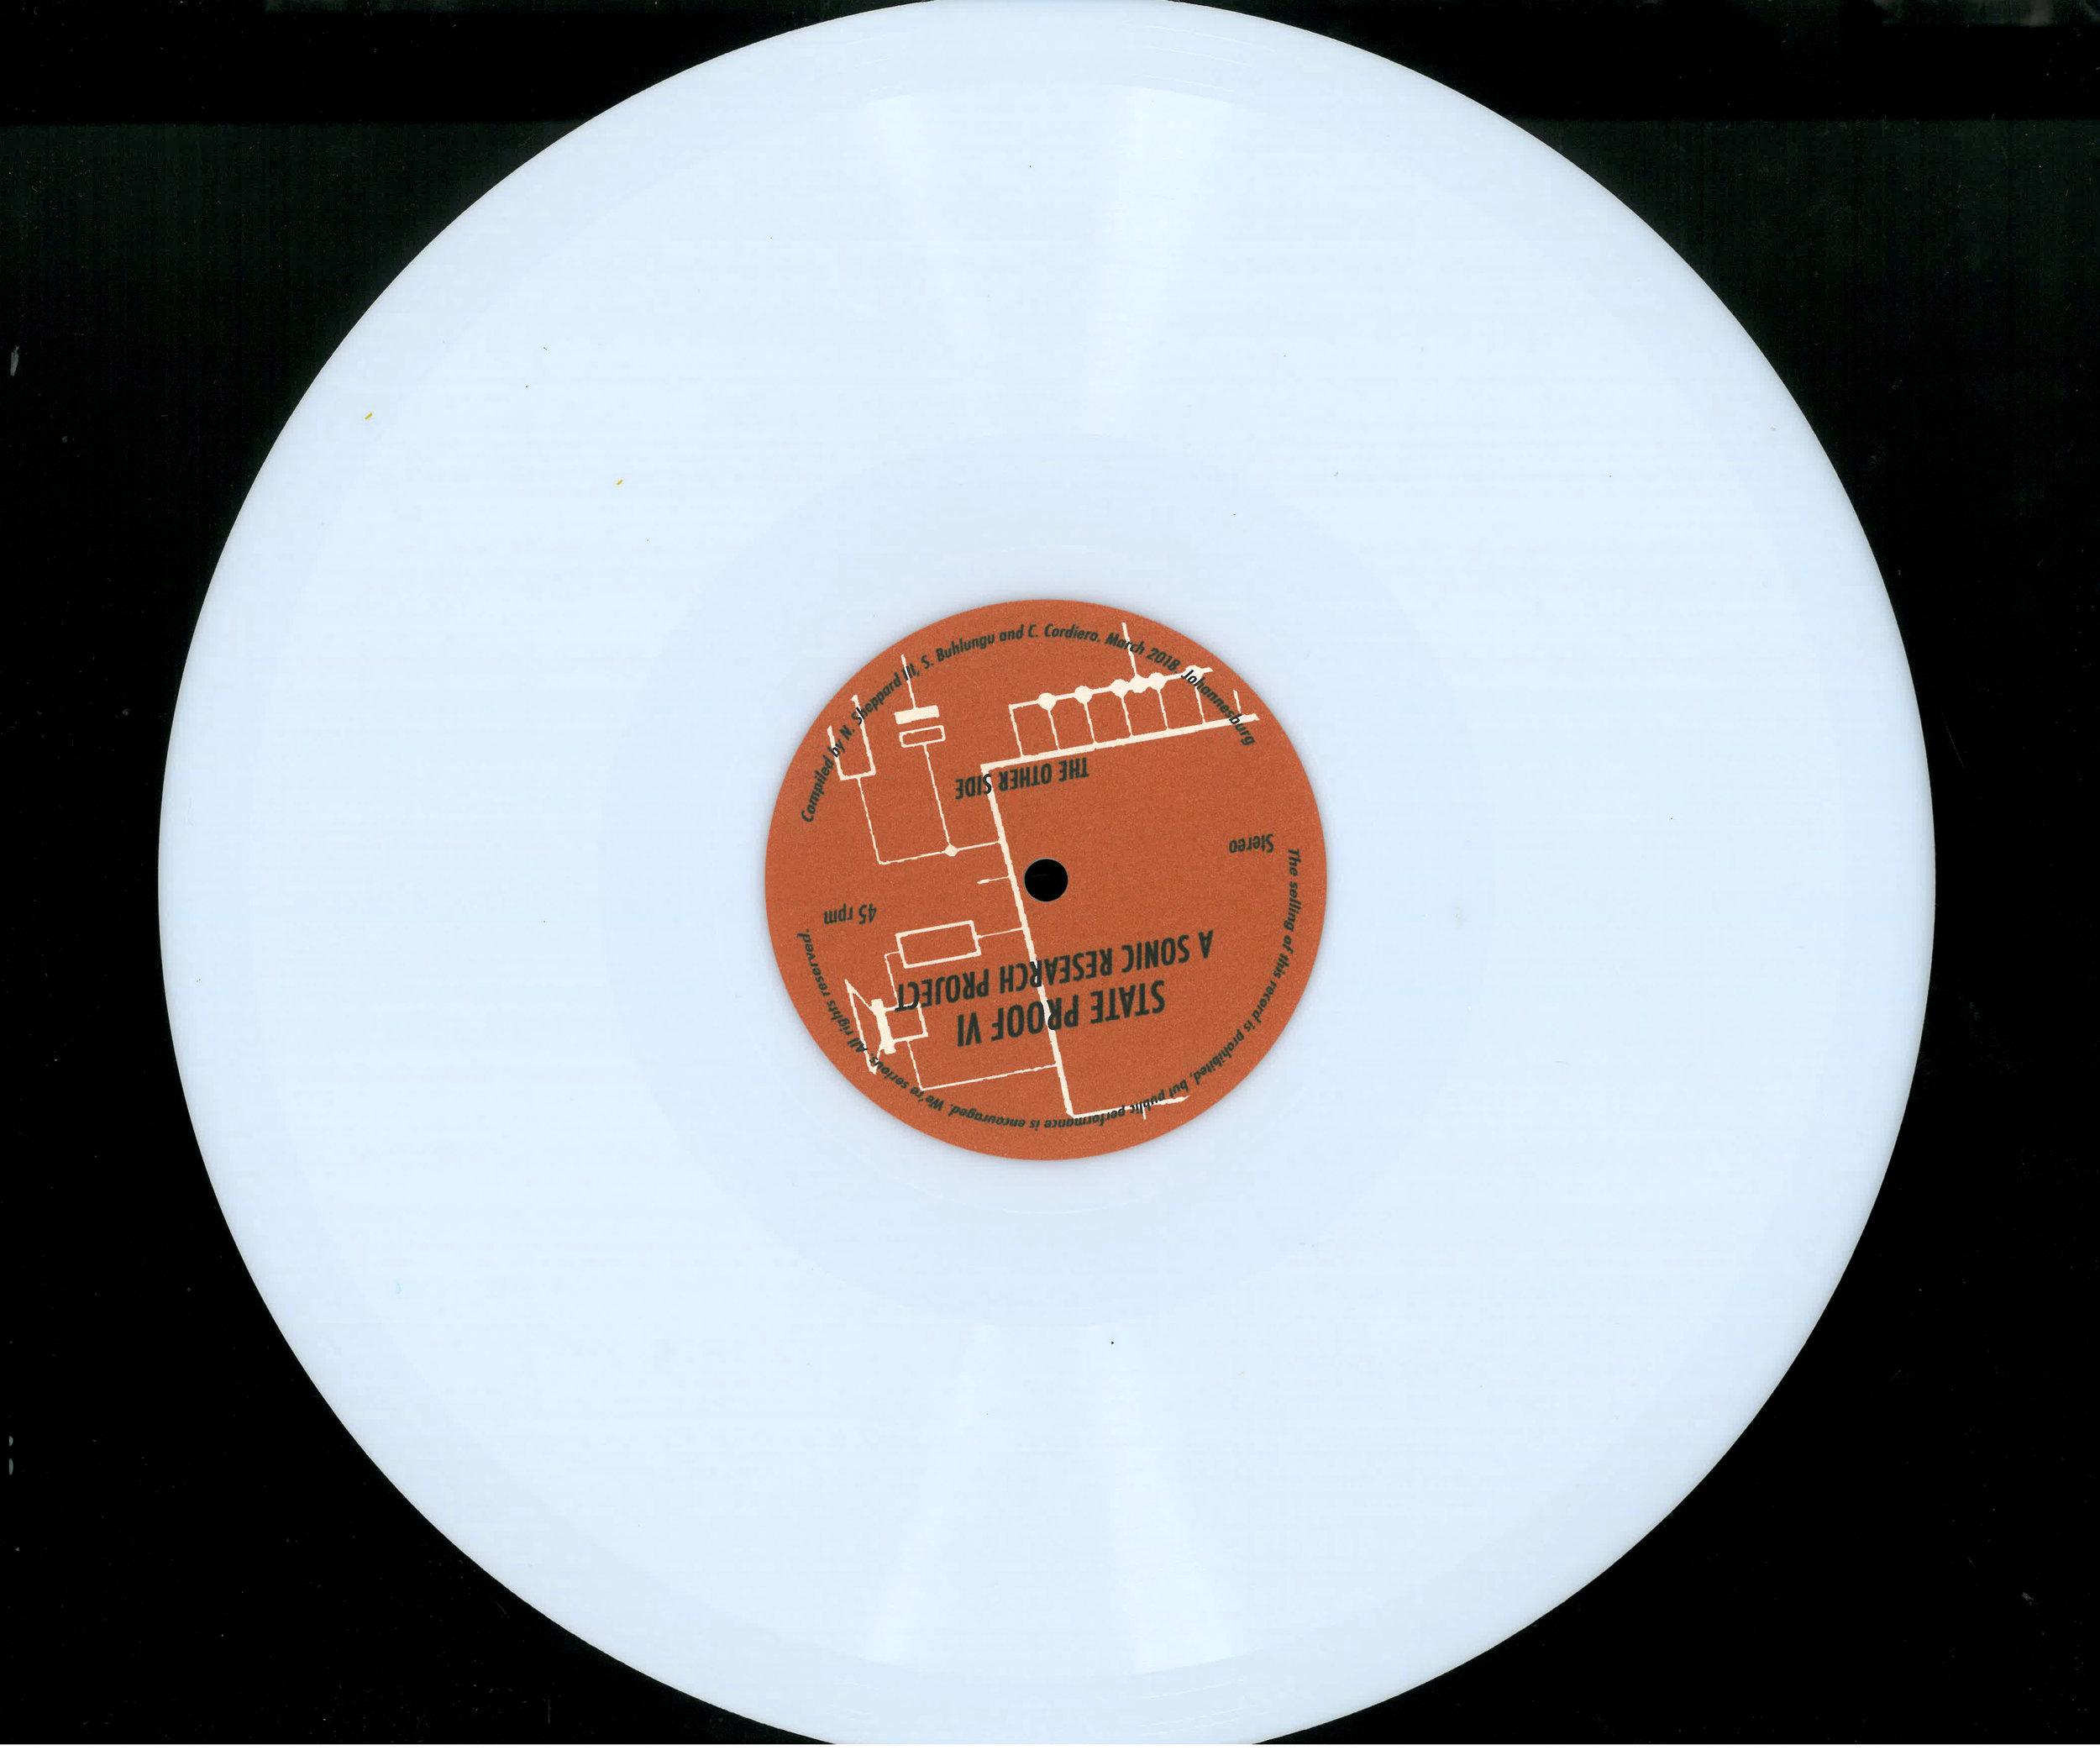 STATE PROOF VI Side B Vinyl.jpg